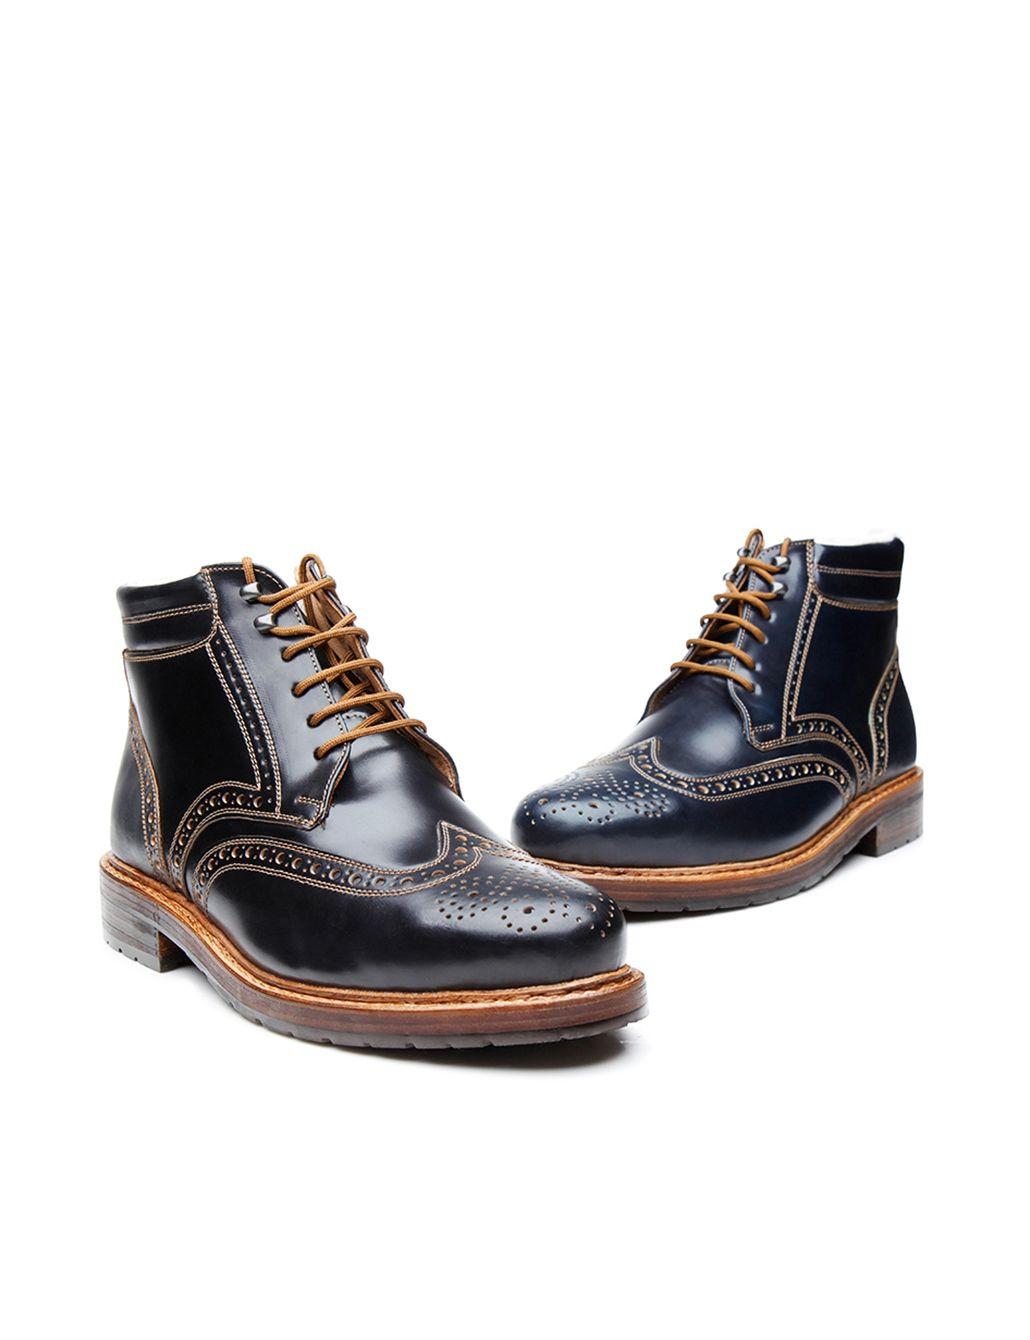 67e6de6adce Buda Full-Brogue C in 2019   Shoes I want   Shoes, Boots, Dress shoes